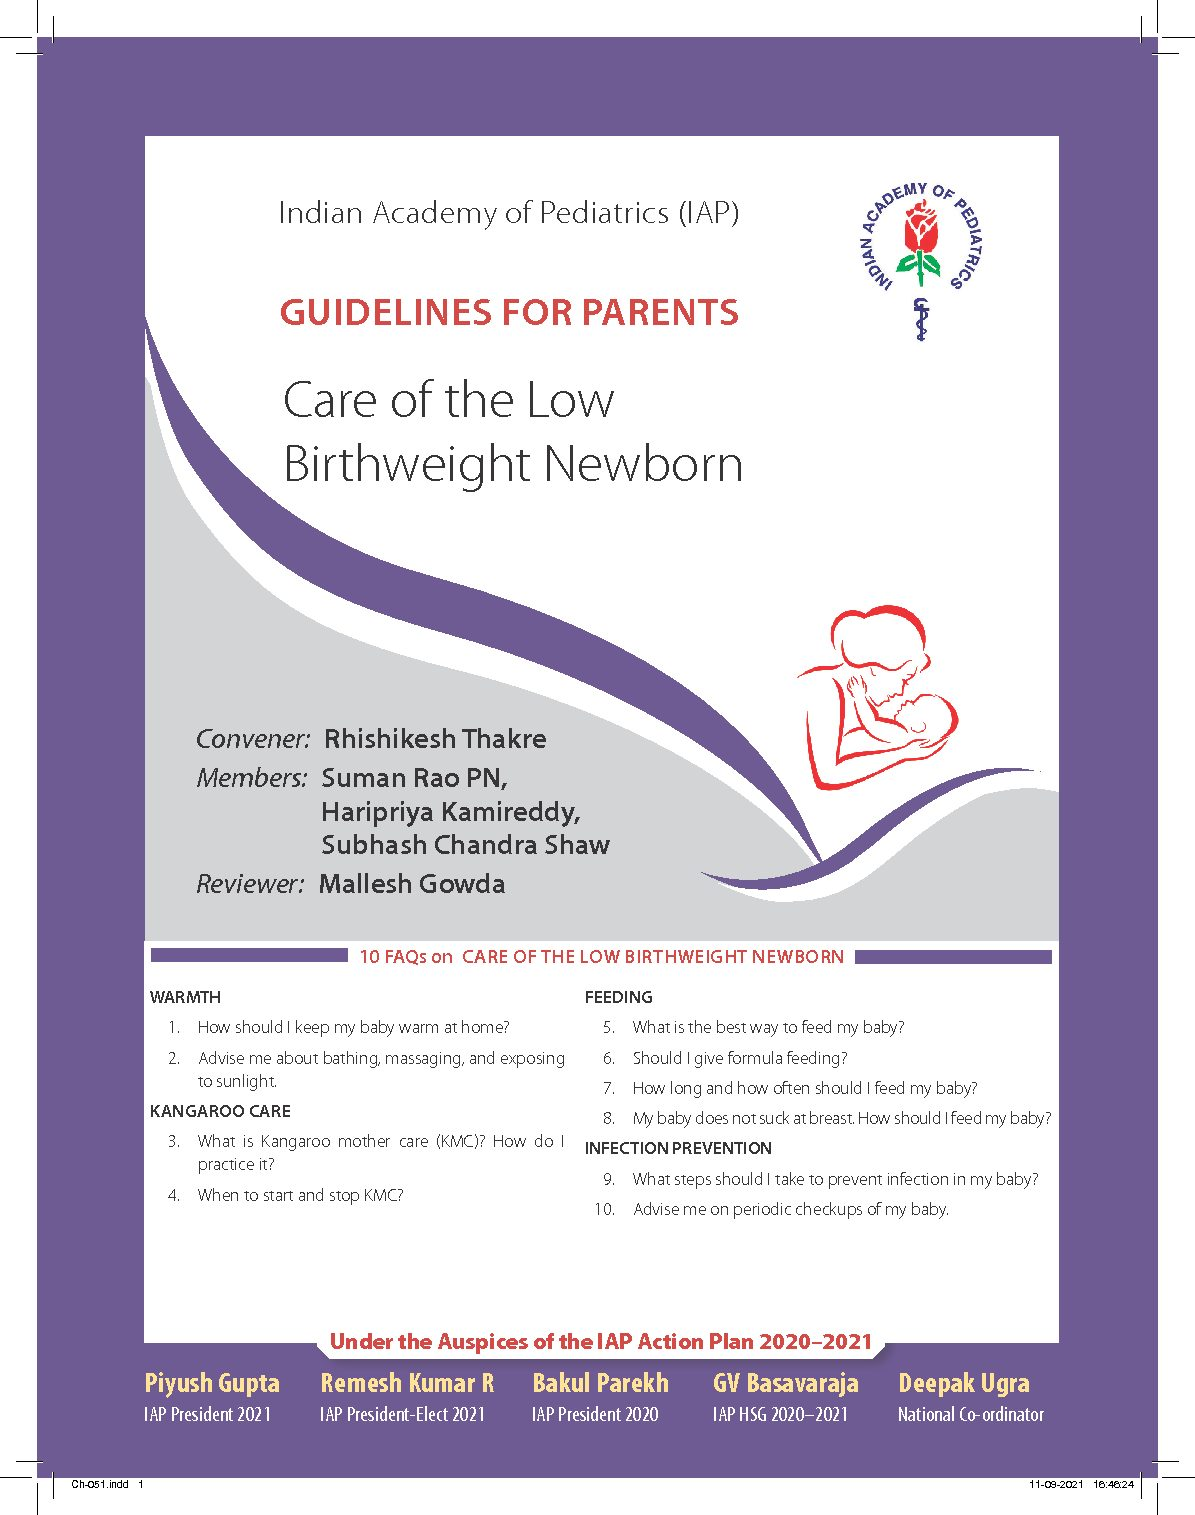 Ch-051-Care-of-LBW-IAP-Parental-Guidelines-1-pdf.jpg